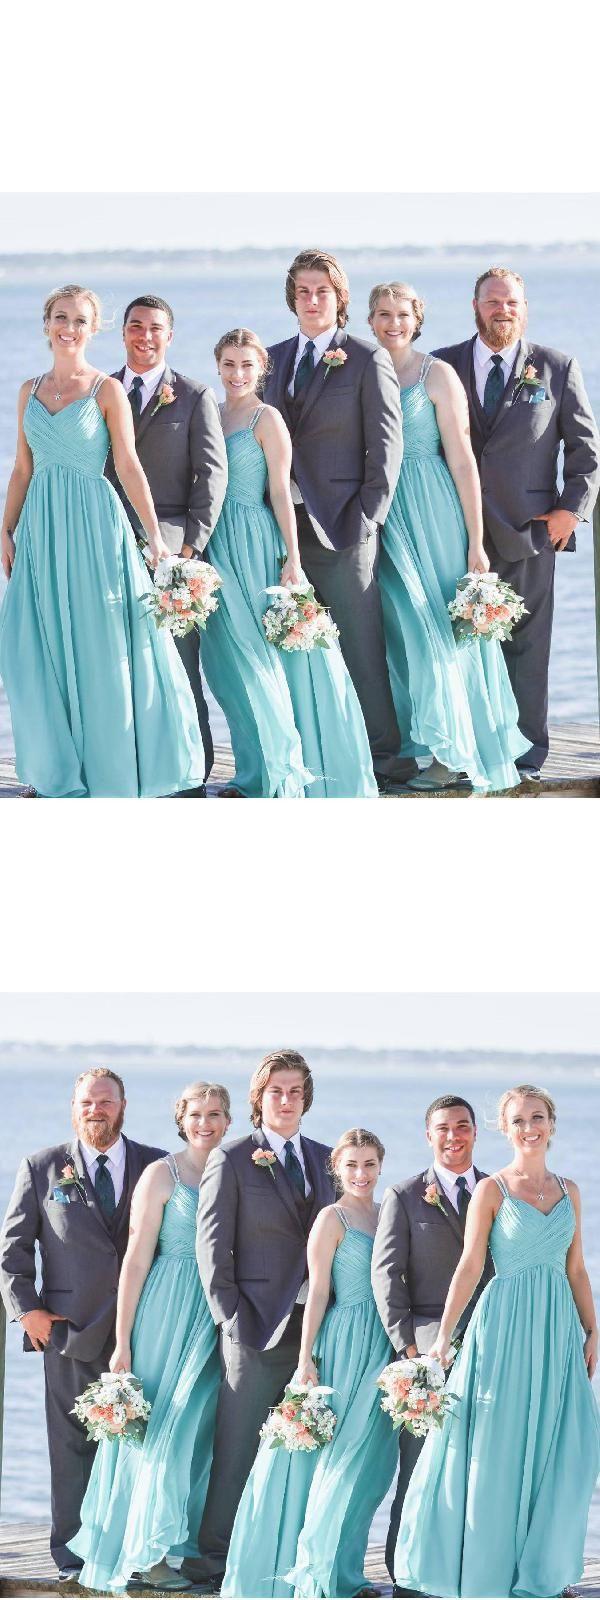 Cheap wedding dress chiffon bridesmaid dress blue wedding dress